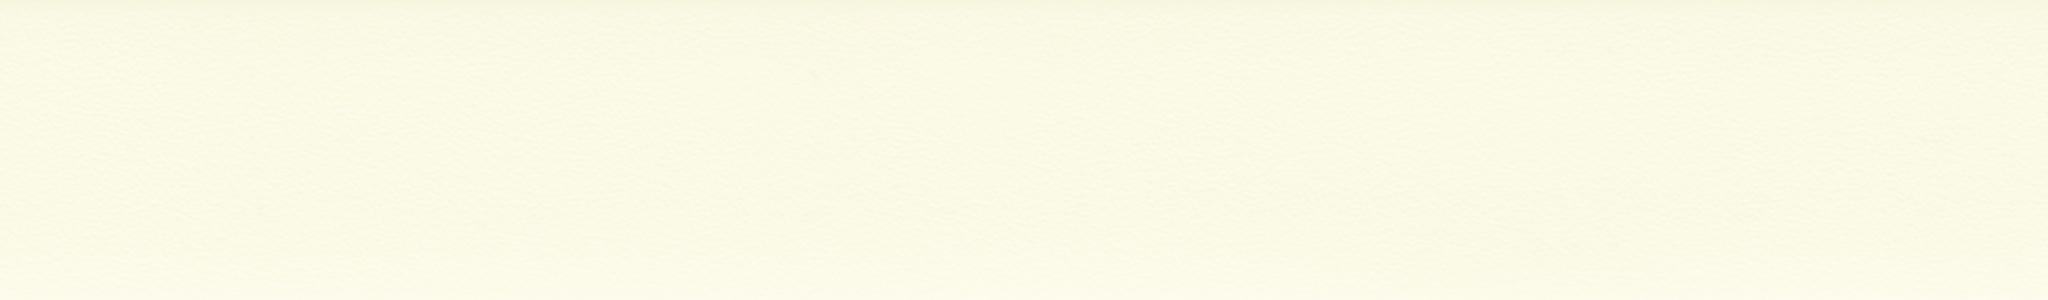 HU 12519 кромка ABS ваниль светлая жемчуг 101